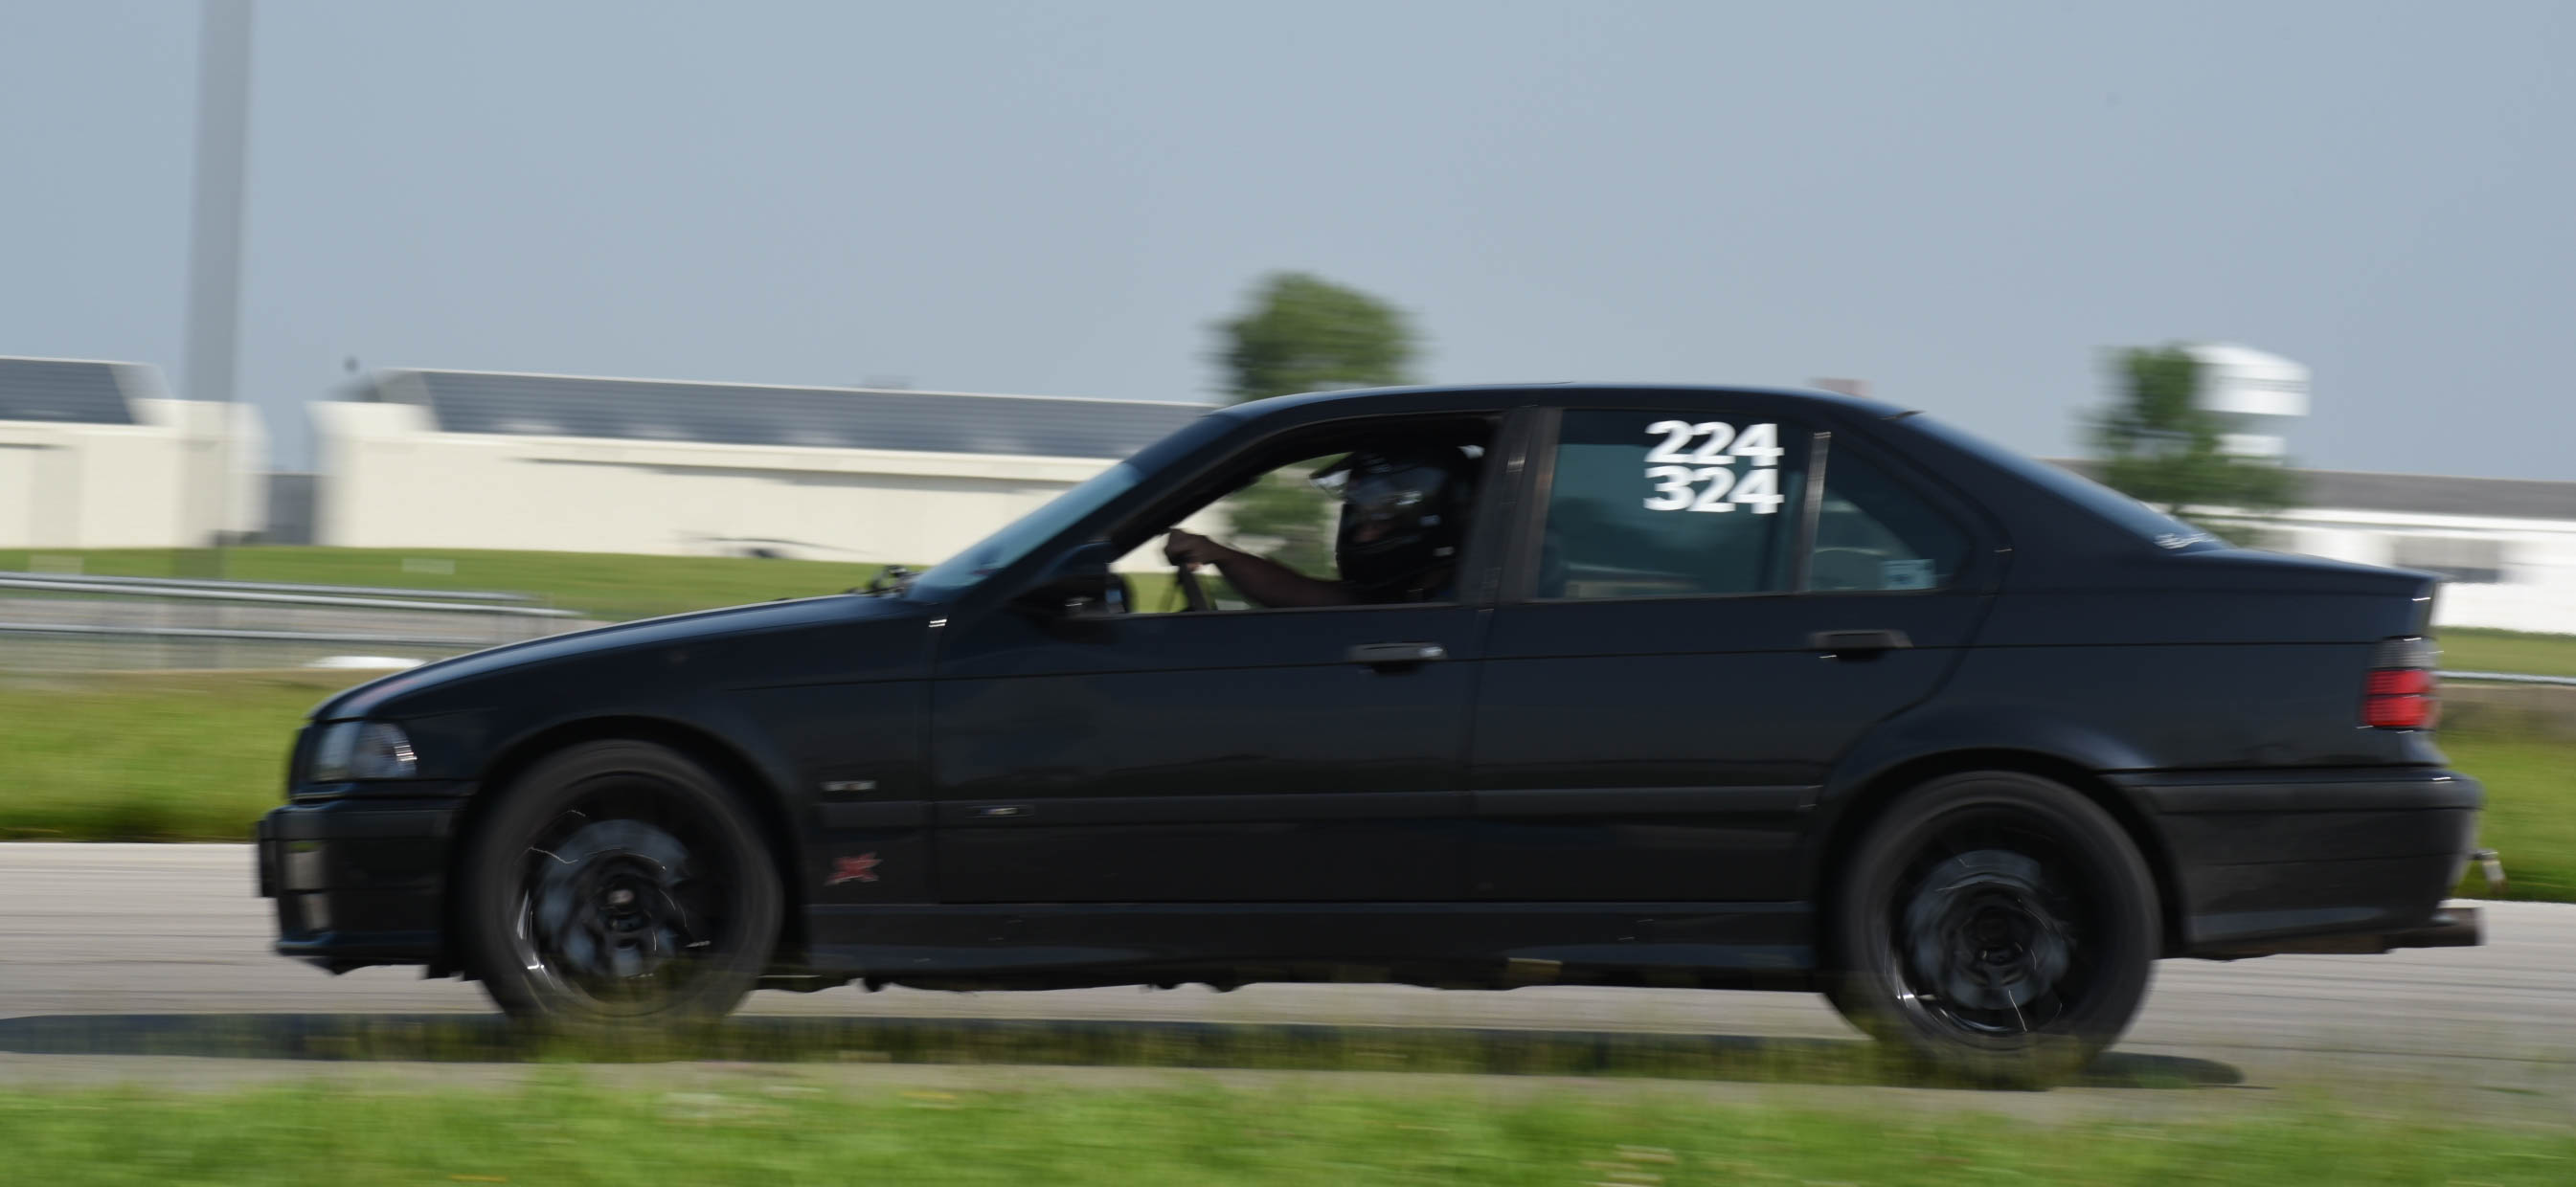 224-3050